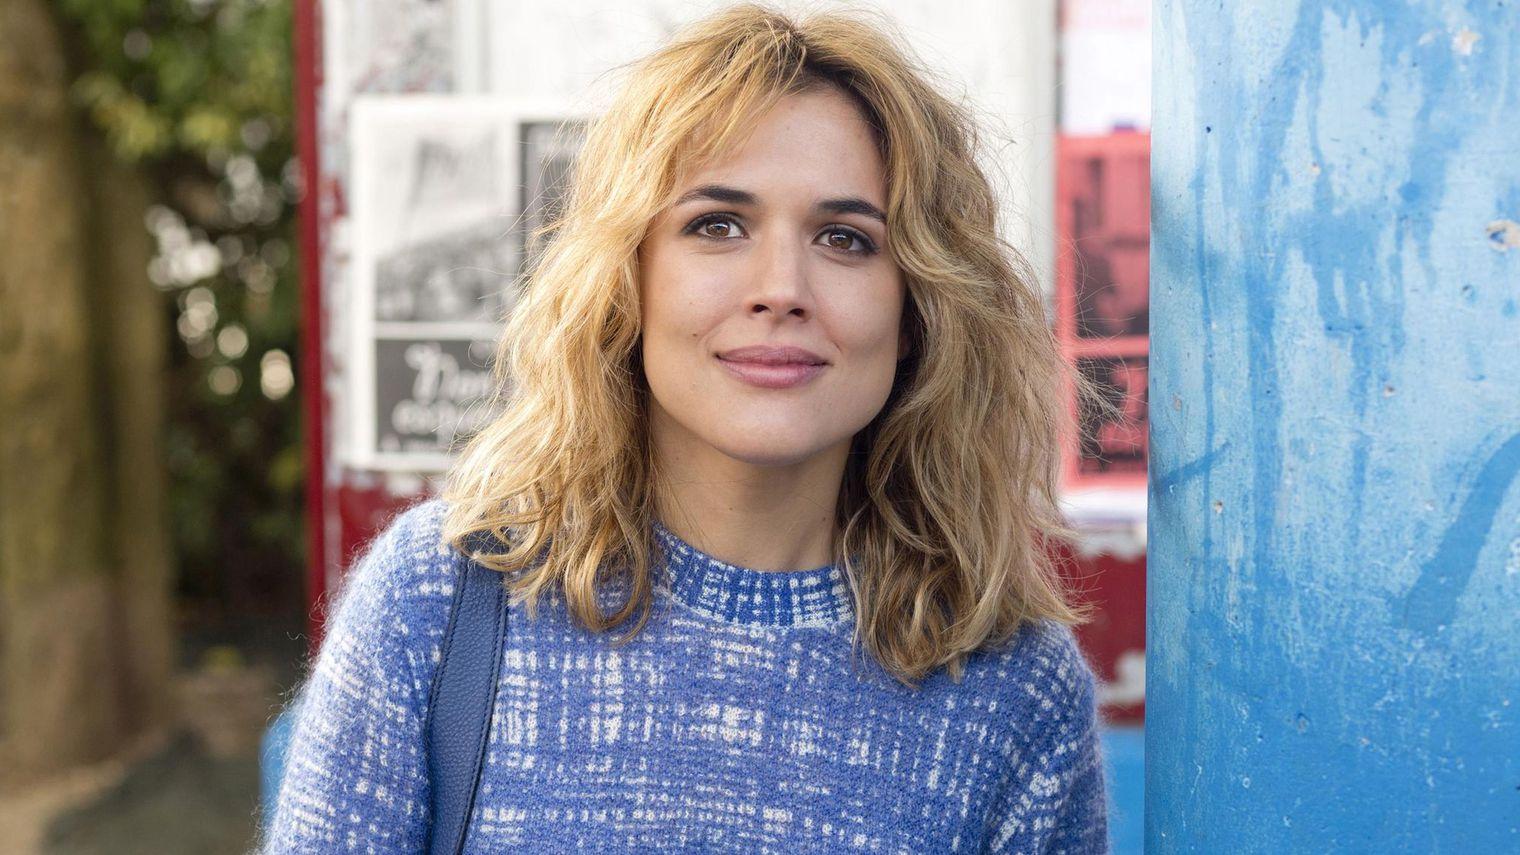 JULIETA - Almodovar film Cannes 2016 Image 2